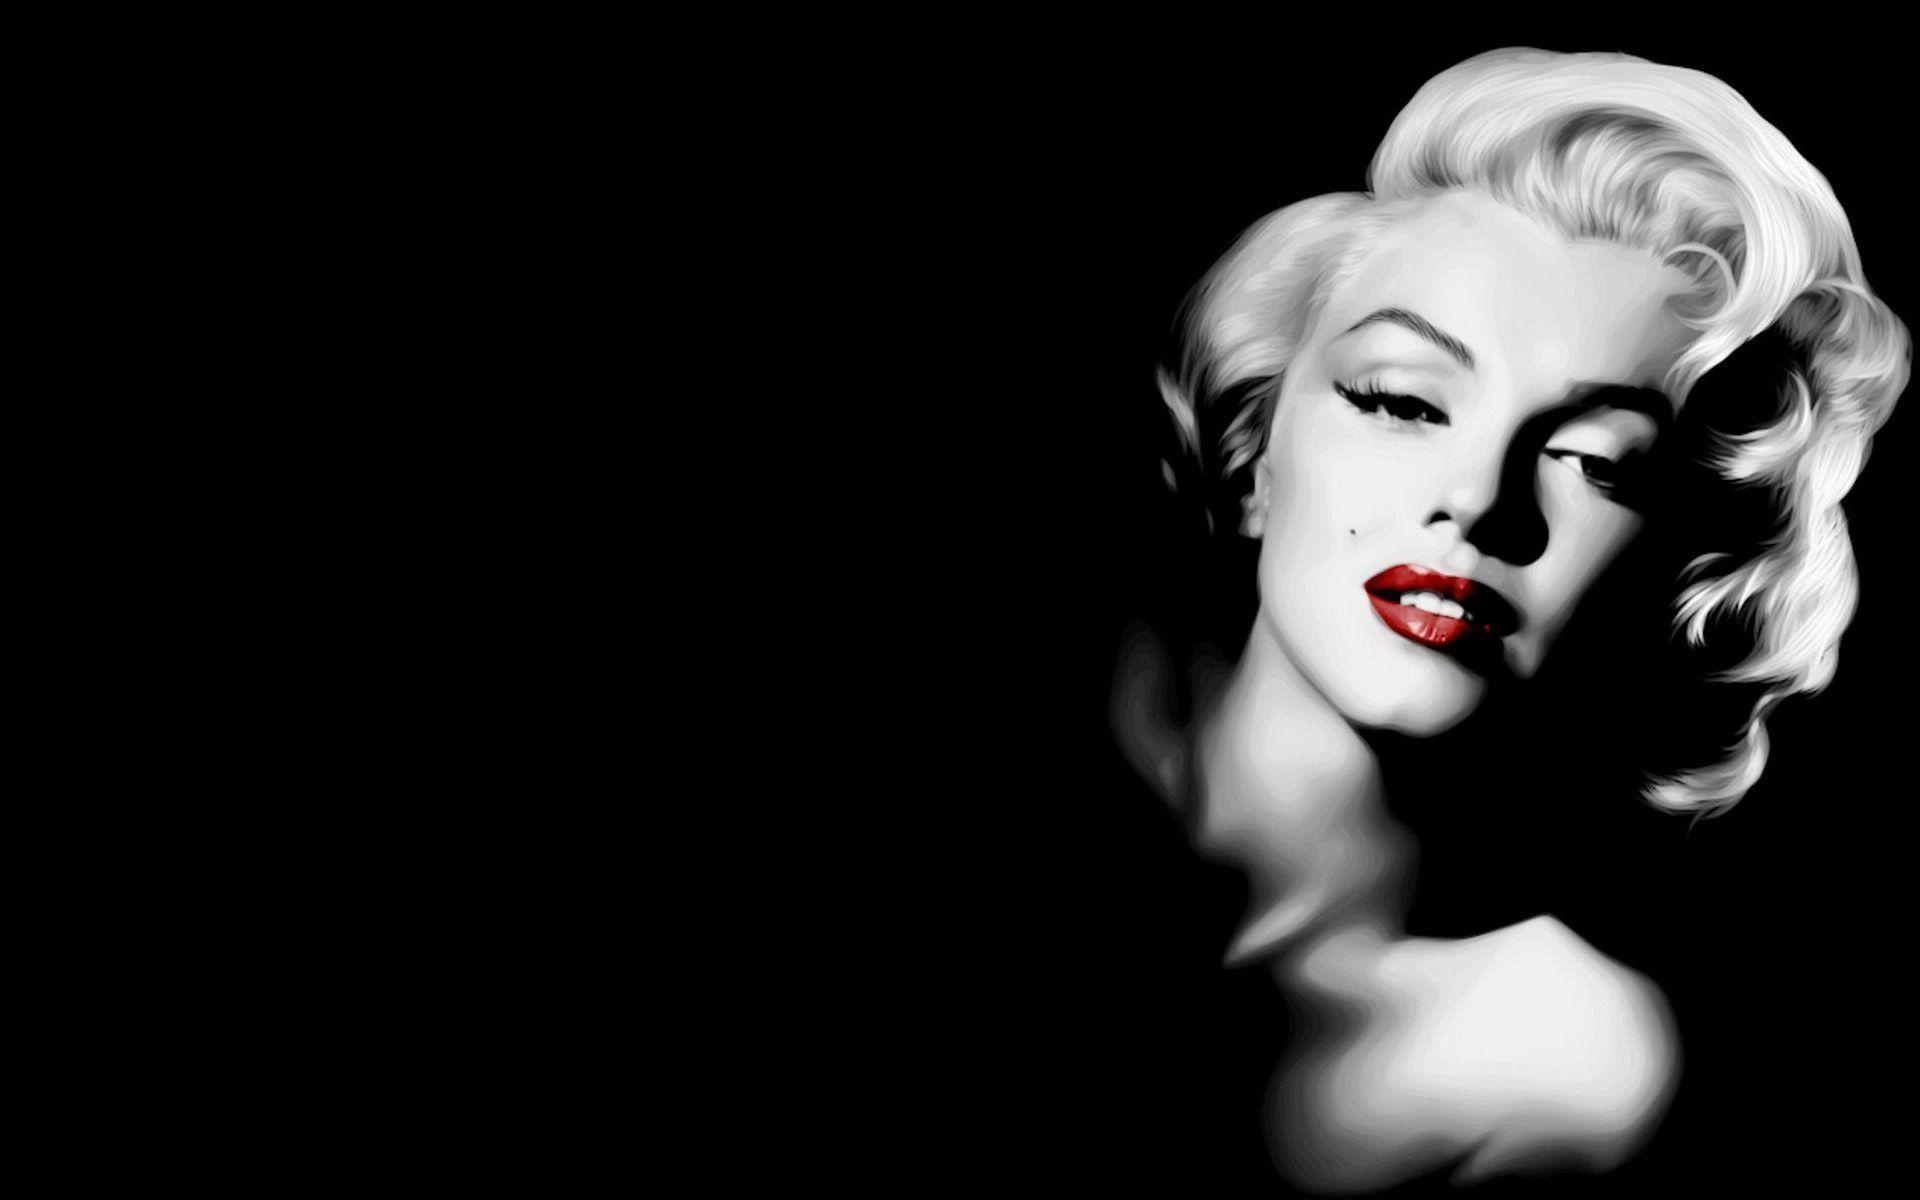 Marilyn Monroe Wallpapers Top Free Marilyn Monroe Backgrounds Wallpaperaccess